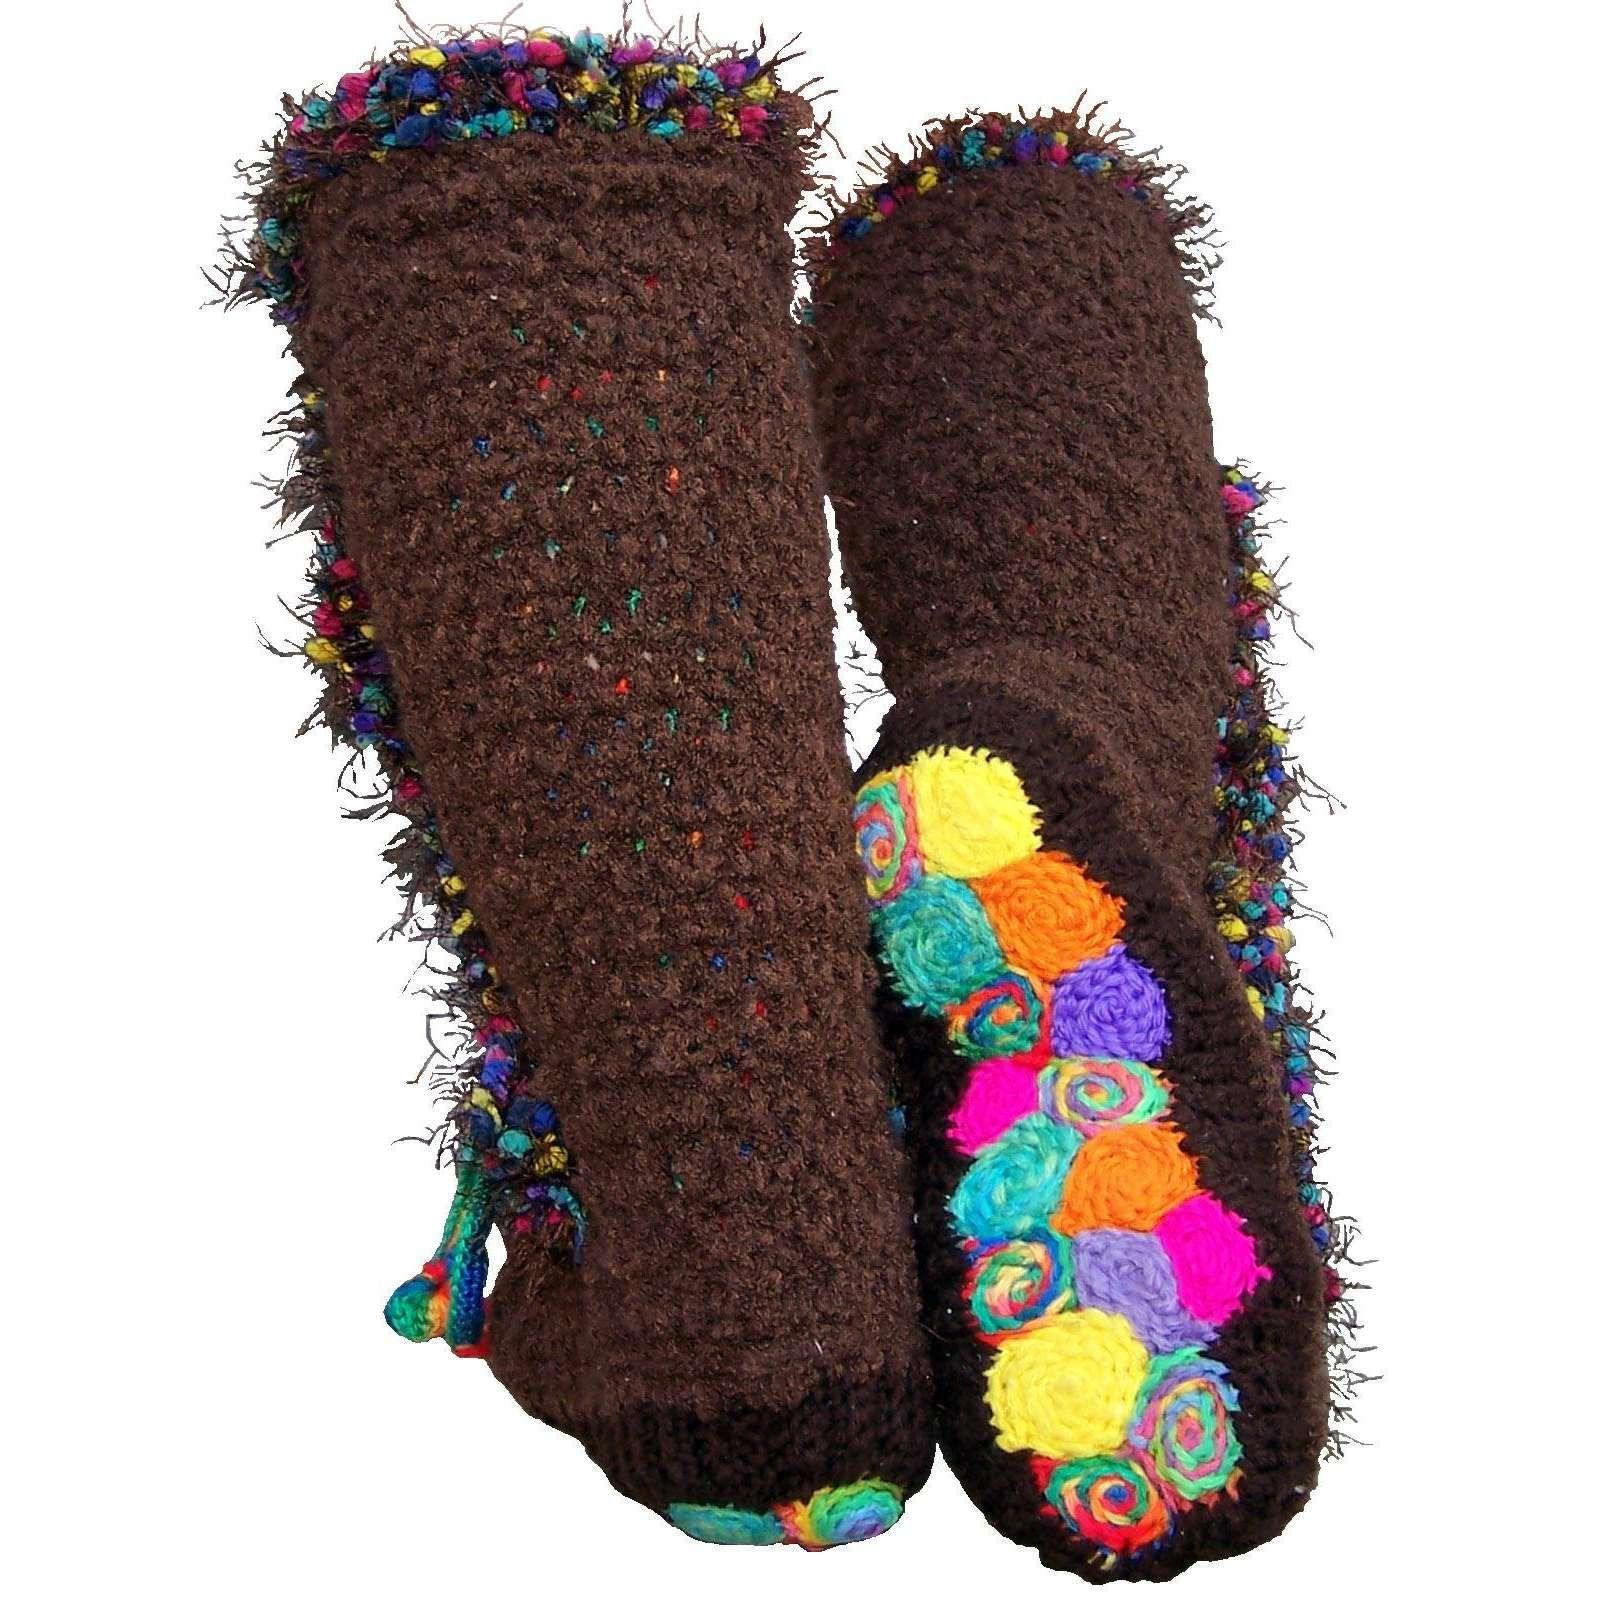 Free crochet mukluk pattern ravelry folksy slipper socks free crochet mukluk pattern ravelry folksy slipper socks crochet mukluk bootsmoccasins bankloansurffo Images